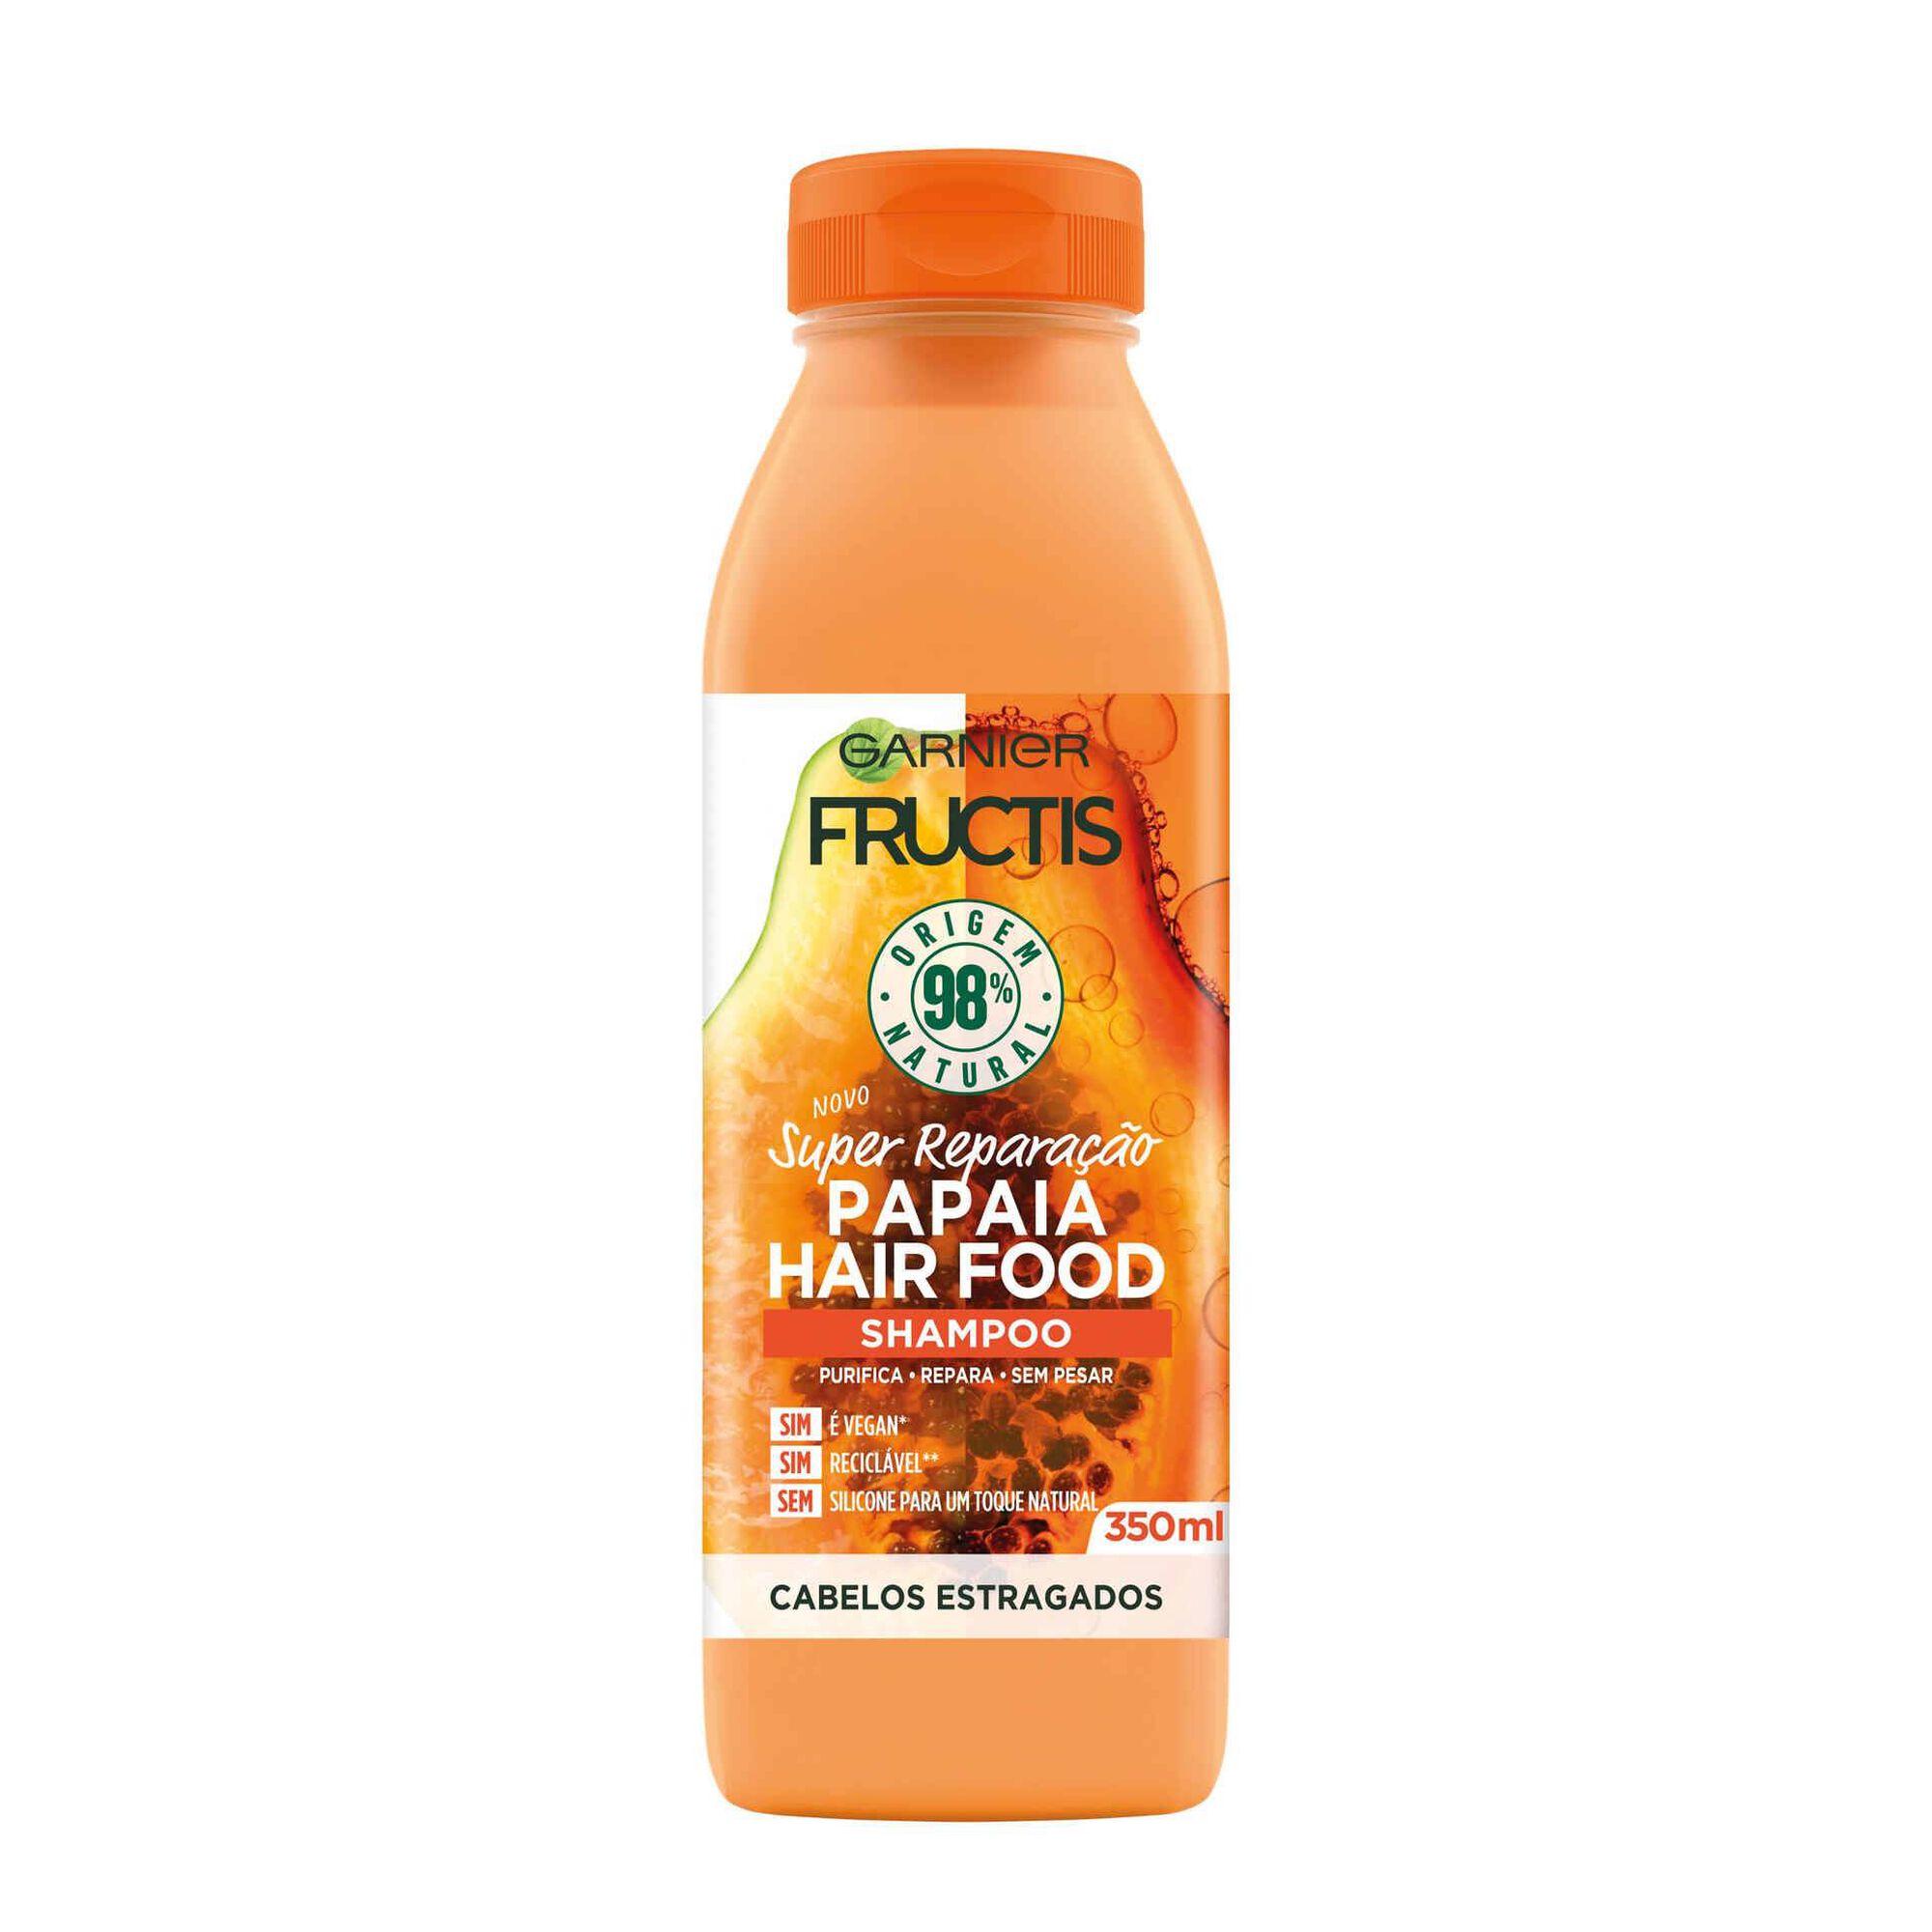 Champô Fructis Hair Food Papaia